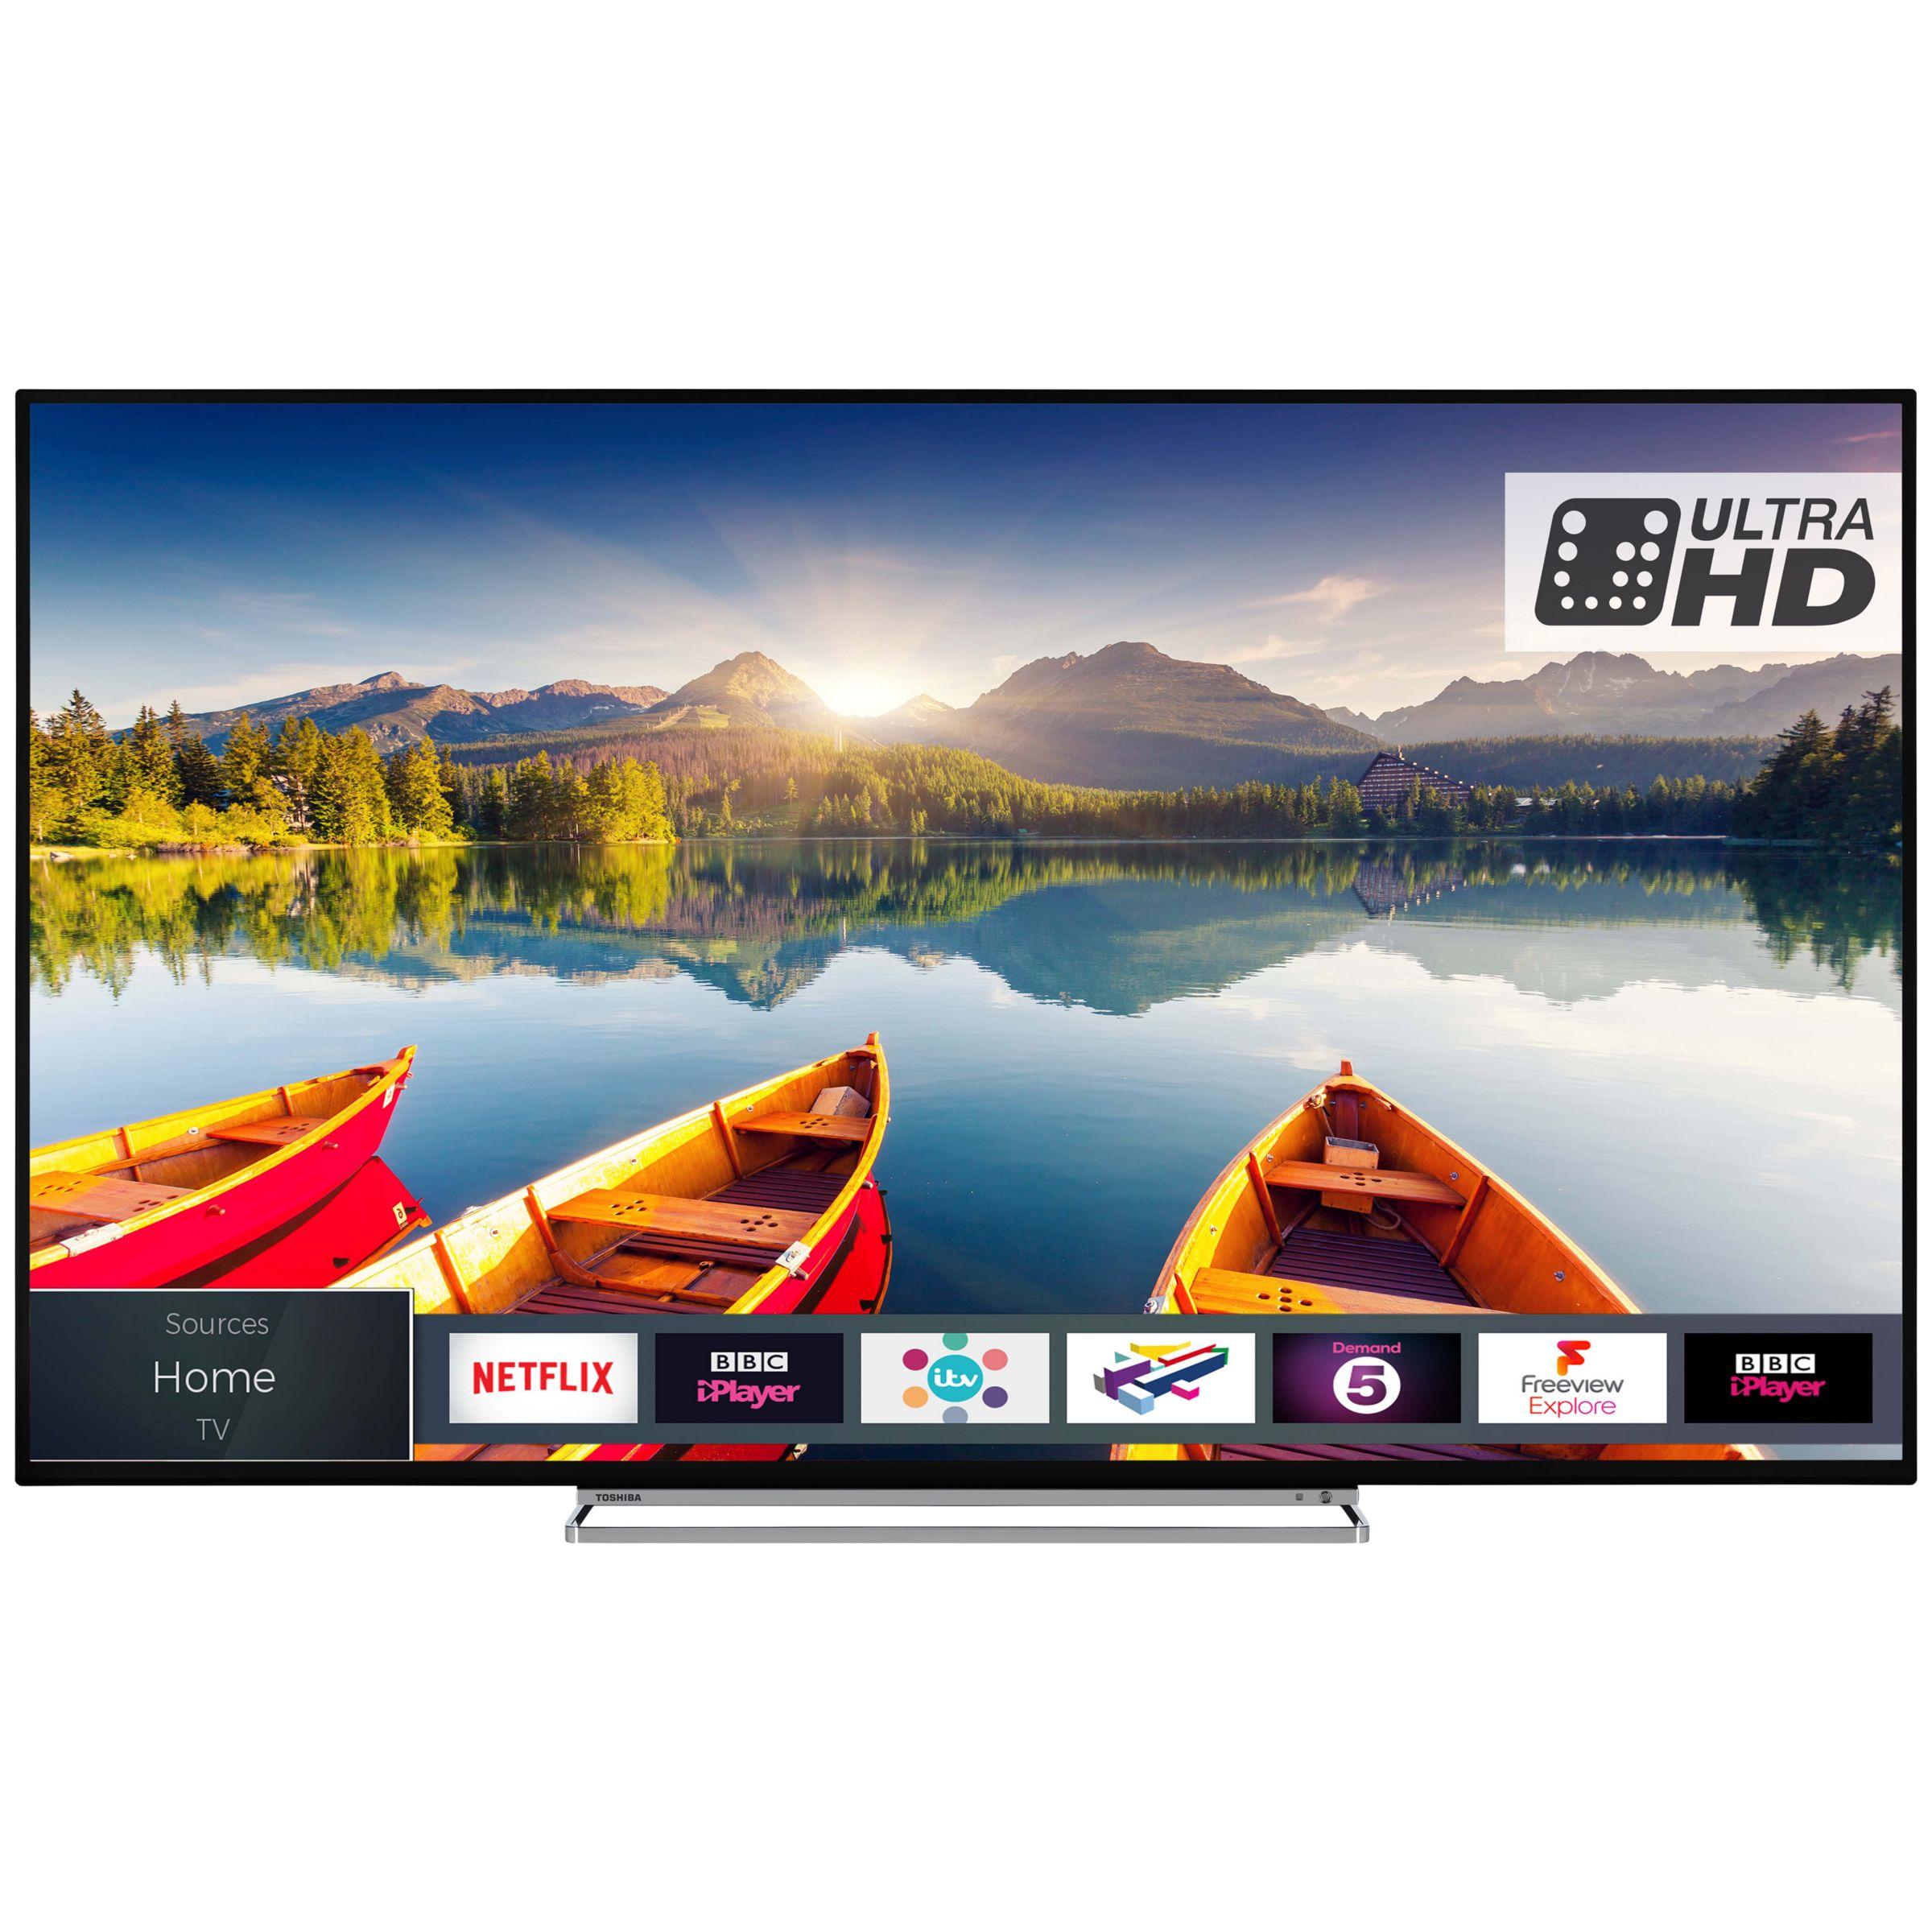 "Toshiba 65U6863DB (2018) 4K UltraHD HDR LED TV Smart TV, 65"" Freeview HD & Freeview Play - £599 del @ John Lewis & Partners (5 Yr Guarantee)"